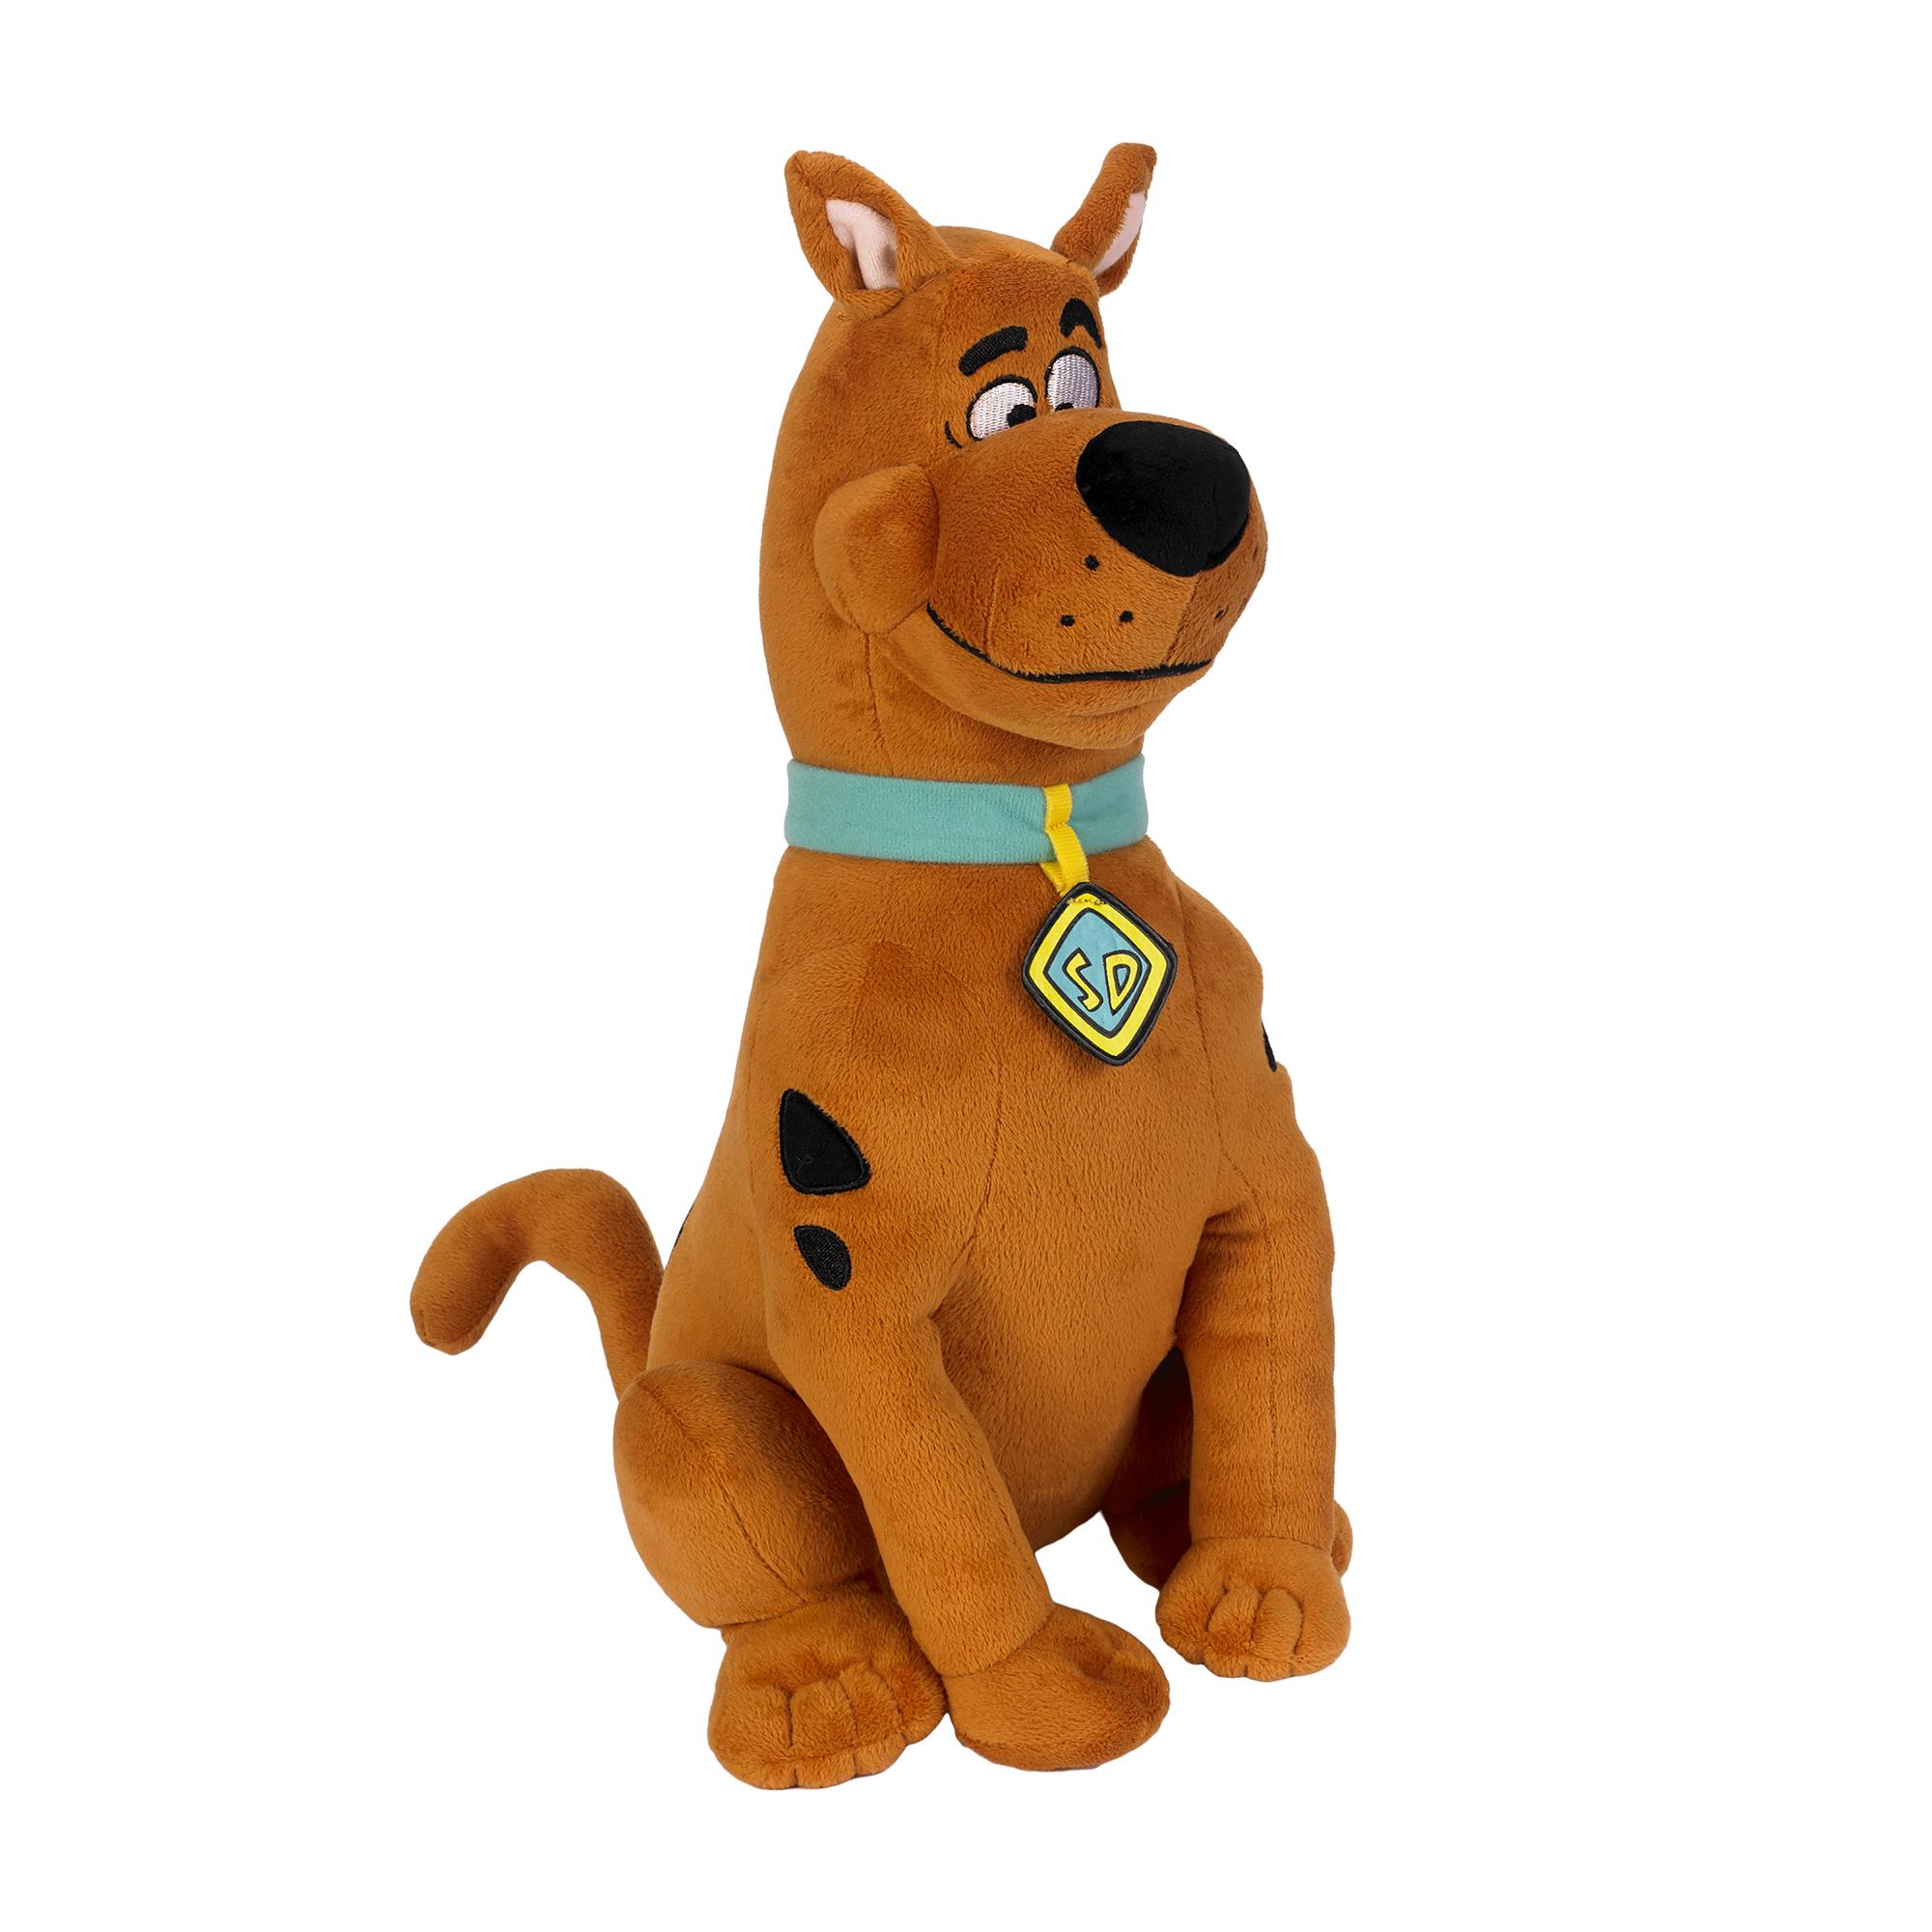 "Very nice condition Vint. Scoob 17/"" Plush Scooby Doo Movie Stuffed animal 2020"